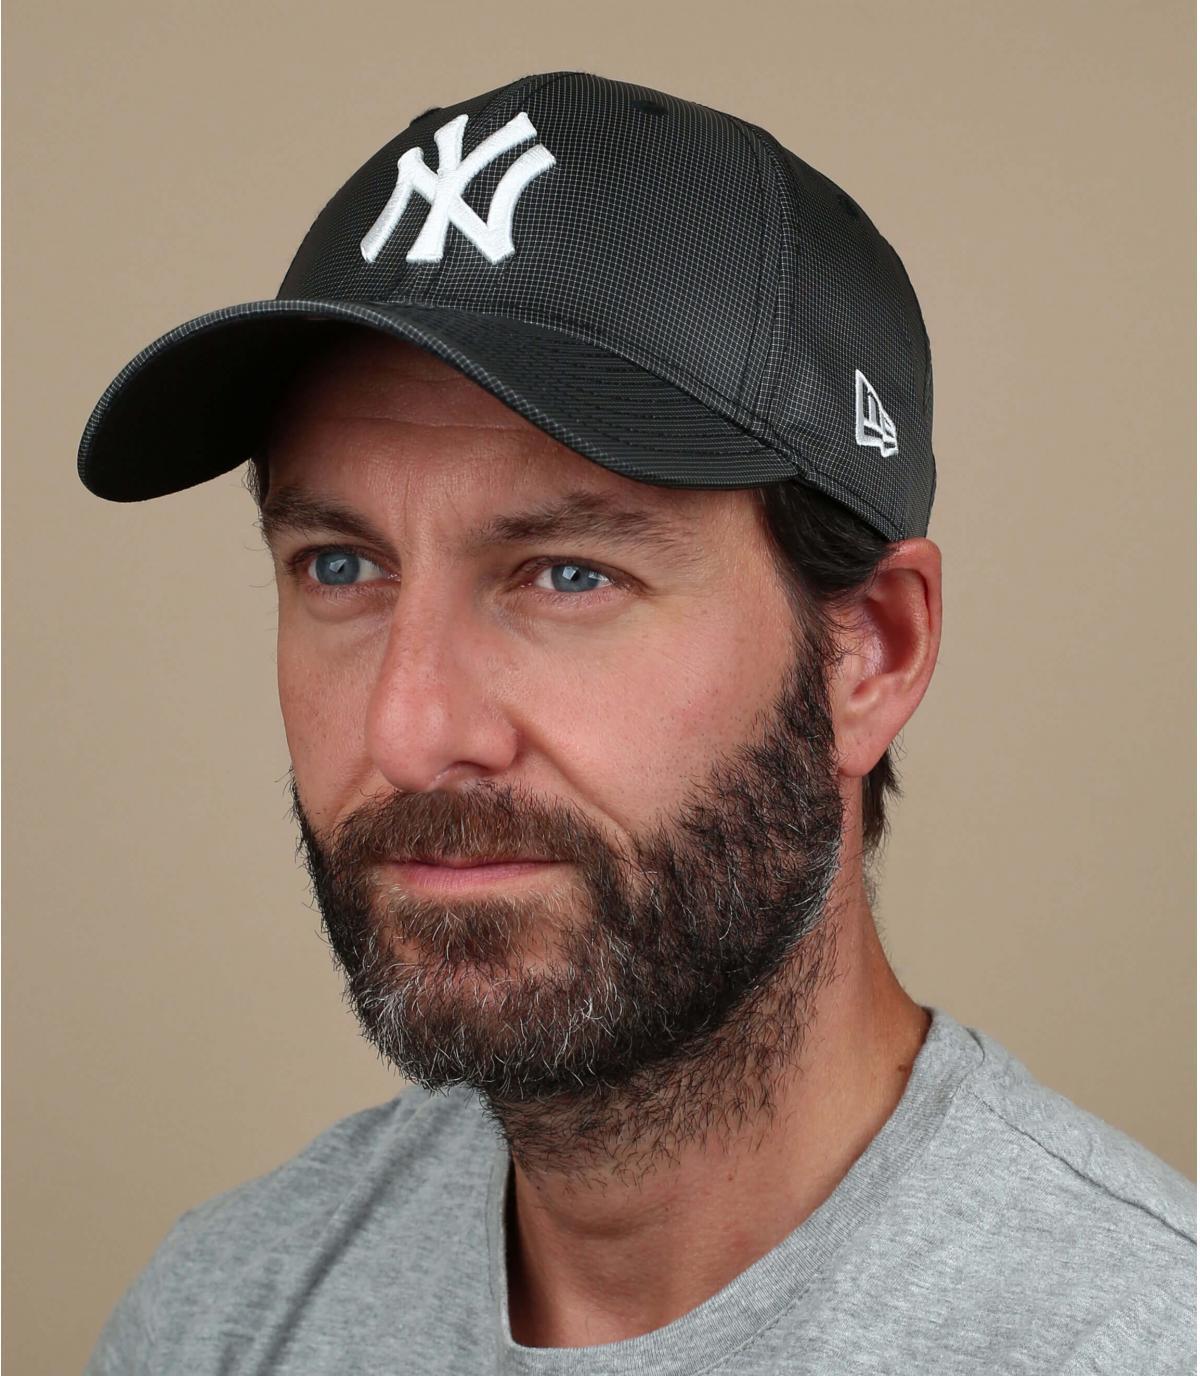 zwarte NY ripstop cap